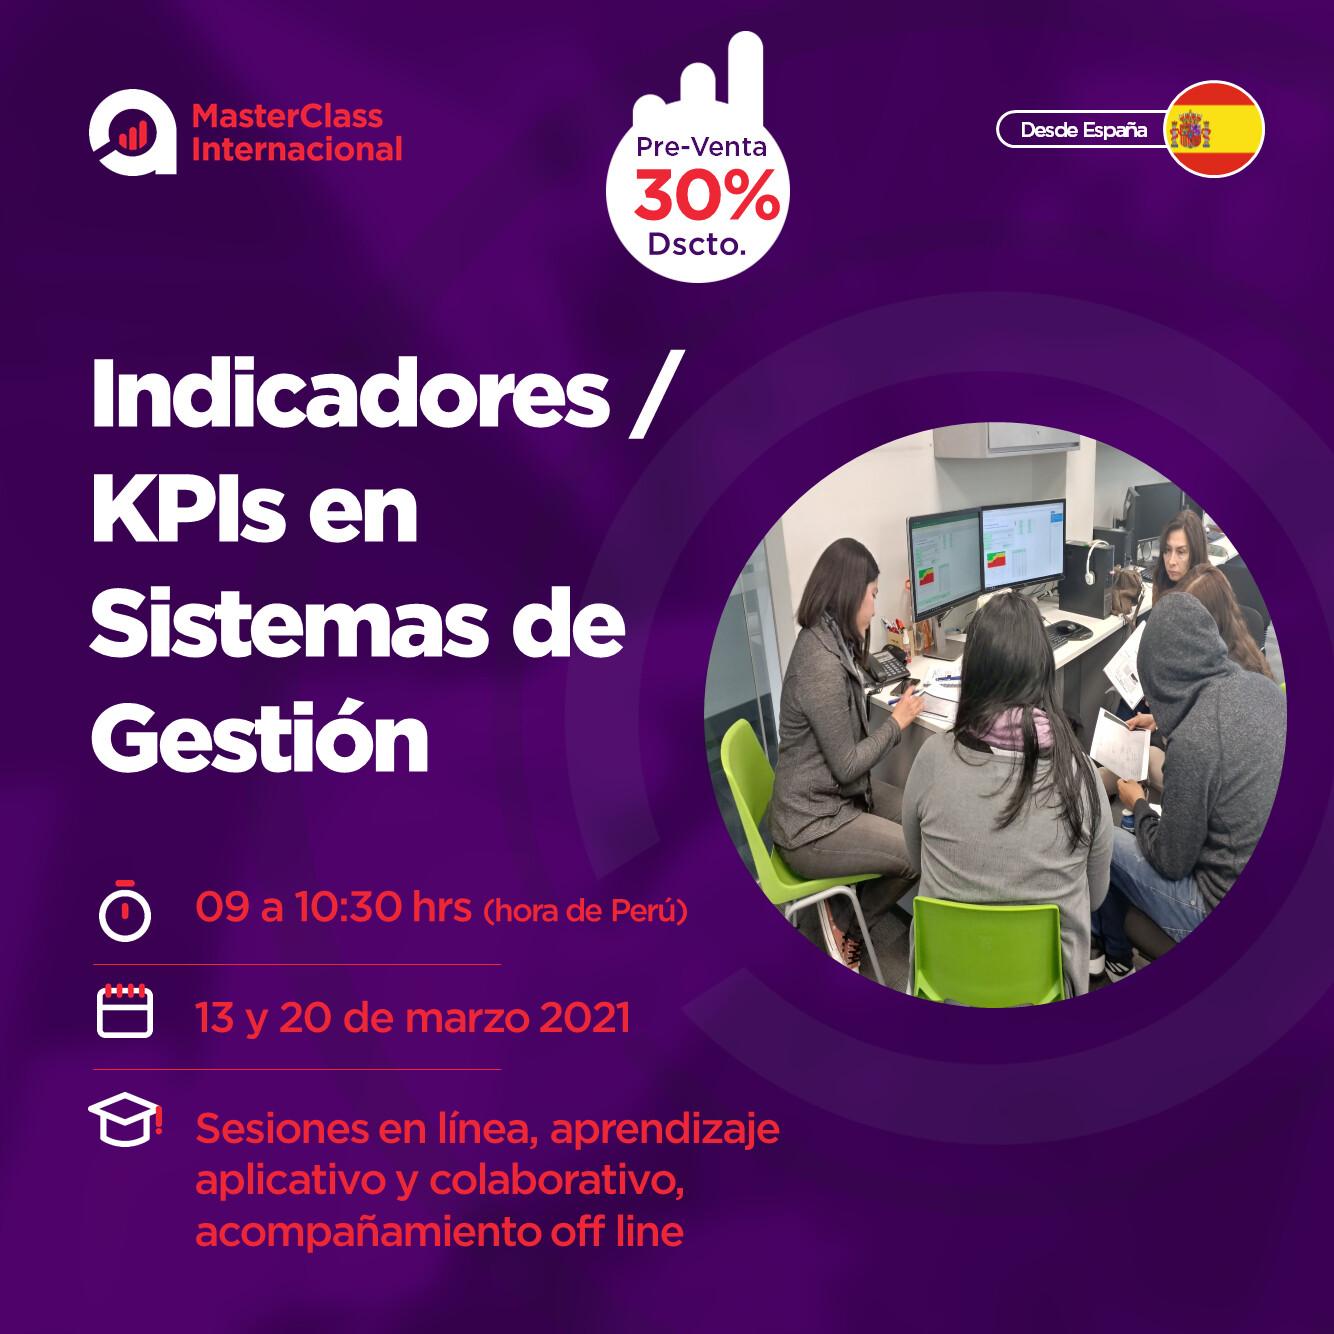 MasterClass: Indicadores - KPIs en Sistemas de Gestion